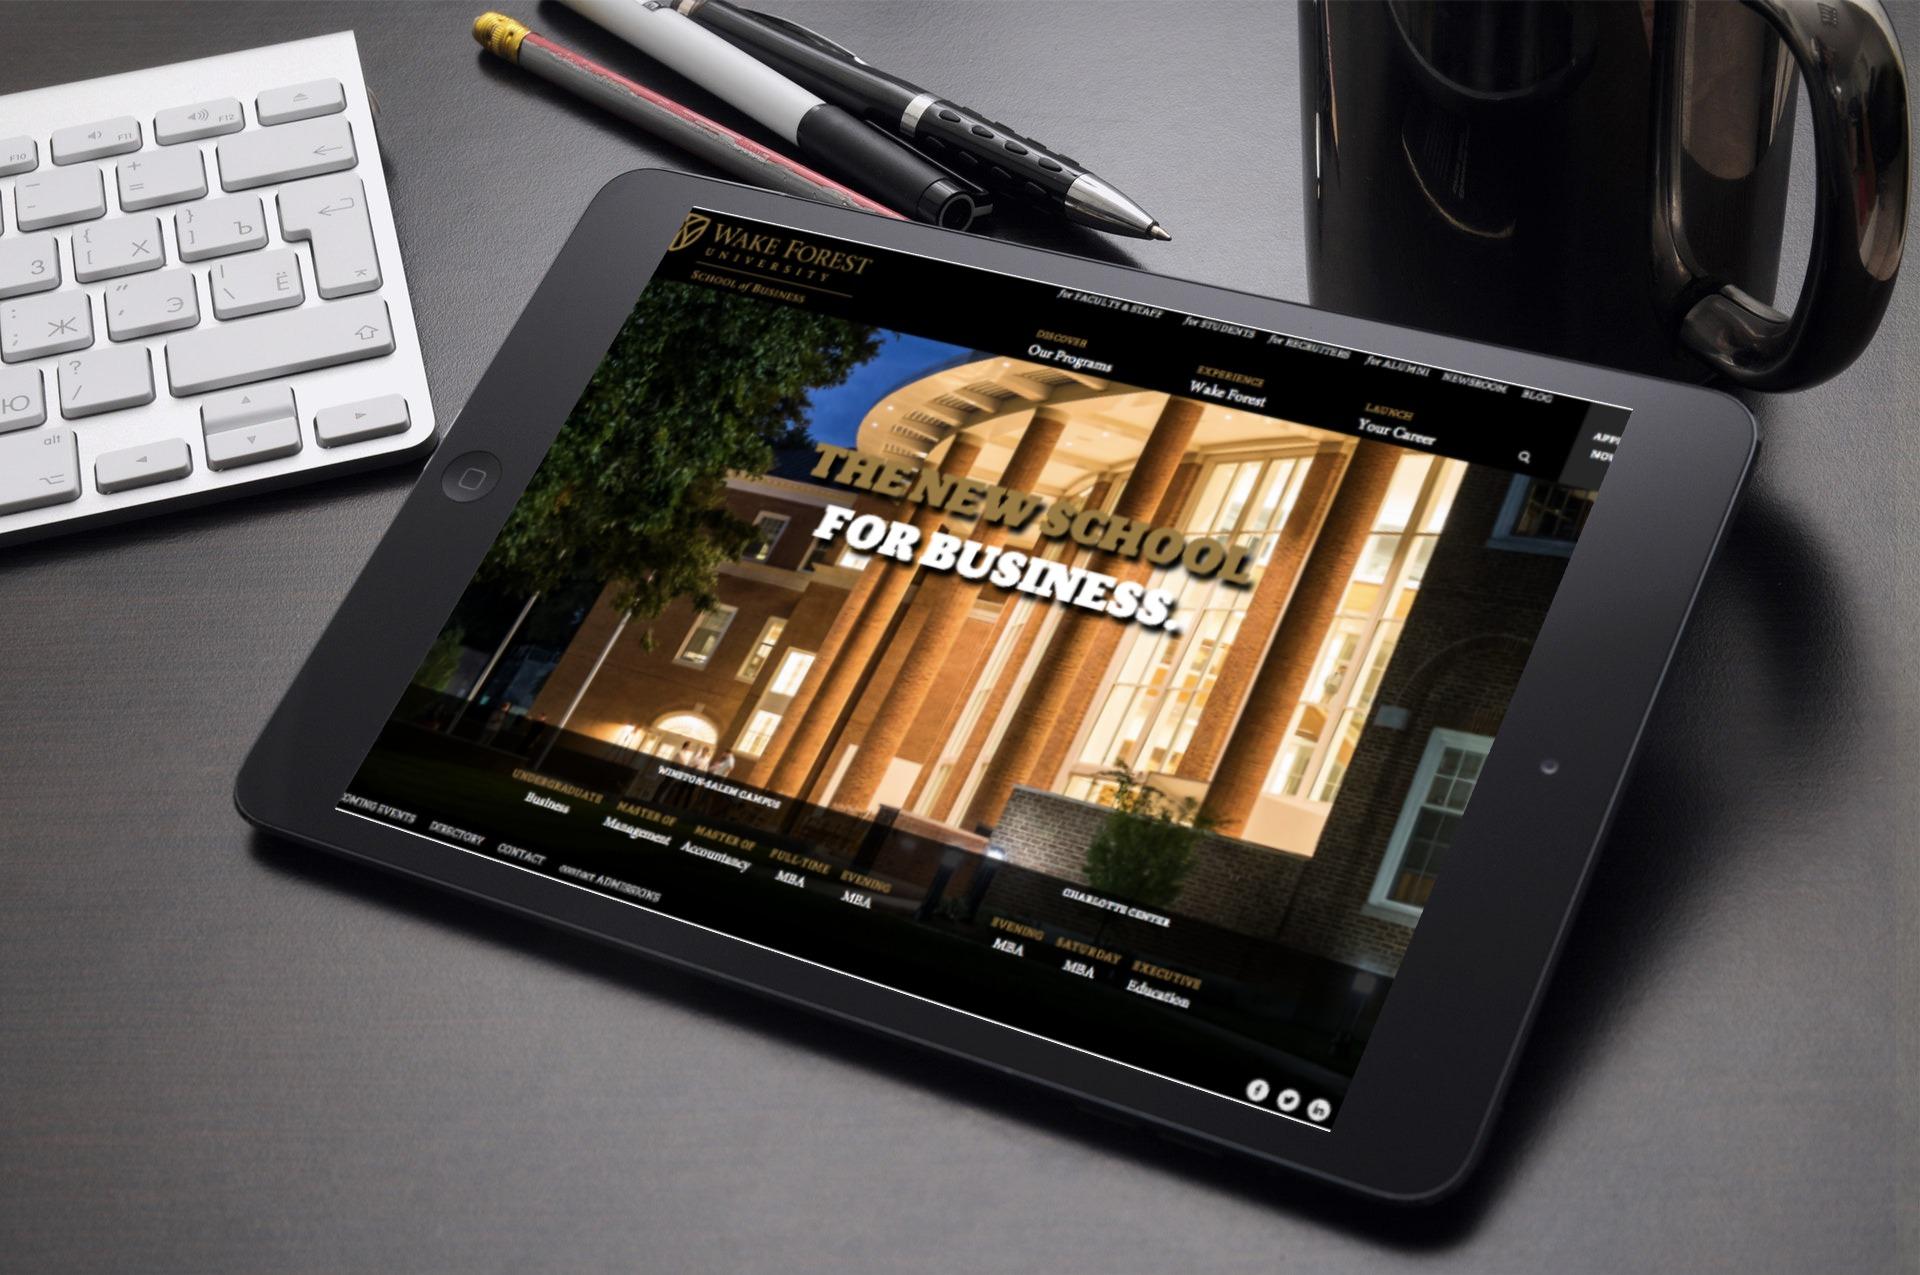 wfu biz best tablet smartmockups_jkq5a7fw